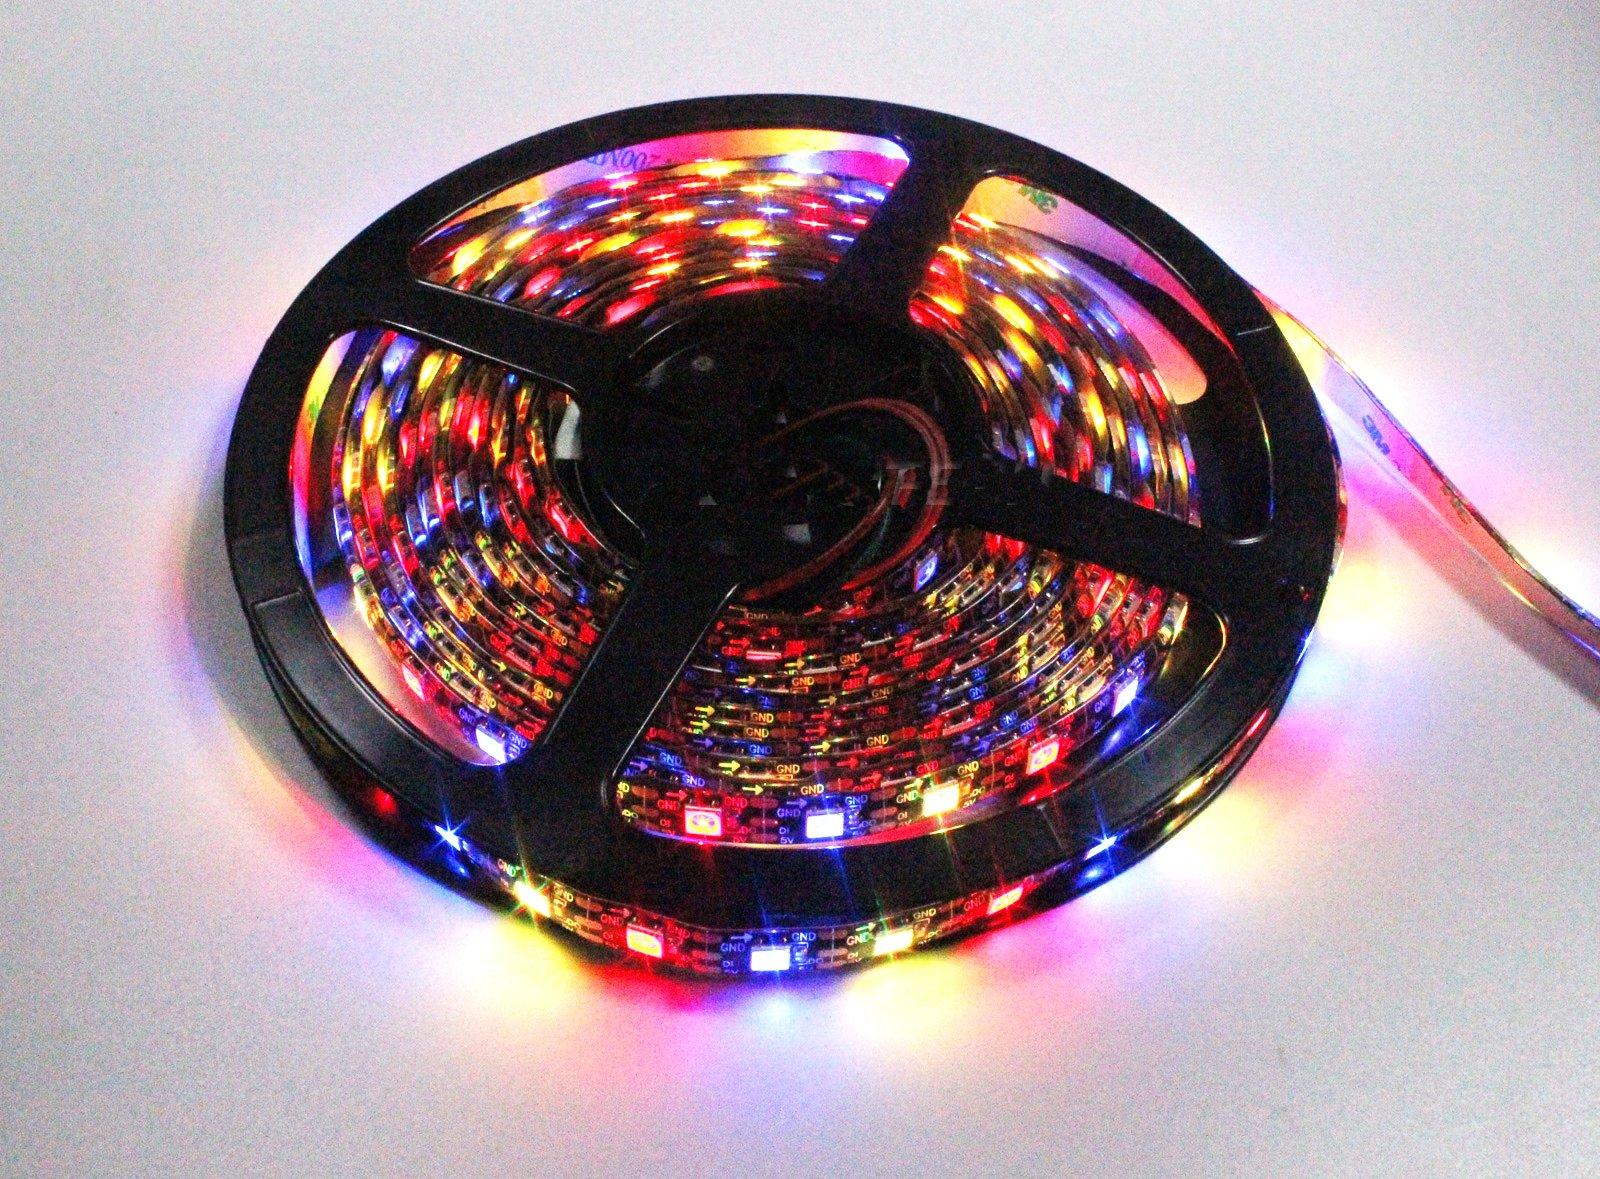 INVOLT WS2812B Individually Addressable LED Strip Light 5050 RGB 16.4ft 300 LED Pixel Flexible Lamp Rope Waterproof IP65 Black PCB DC 5V